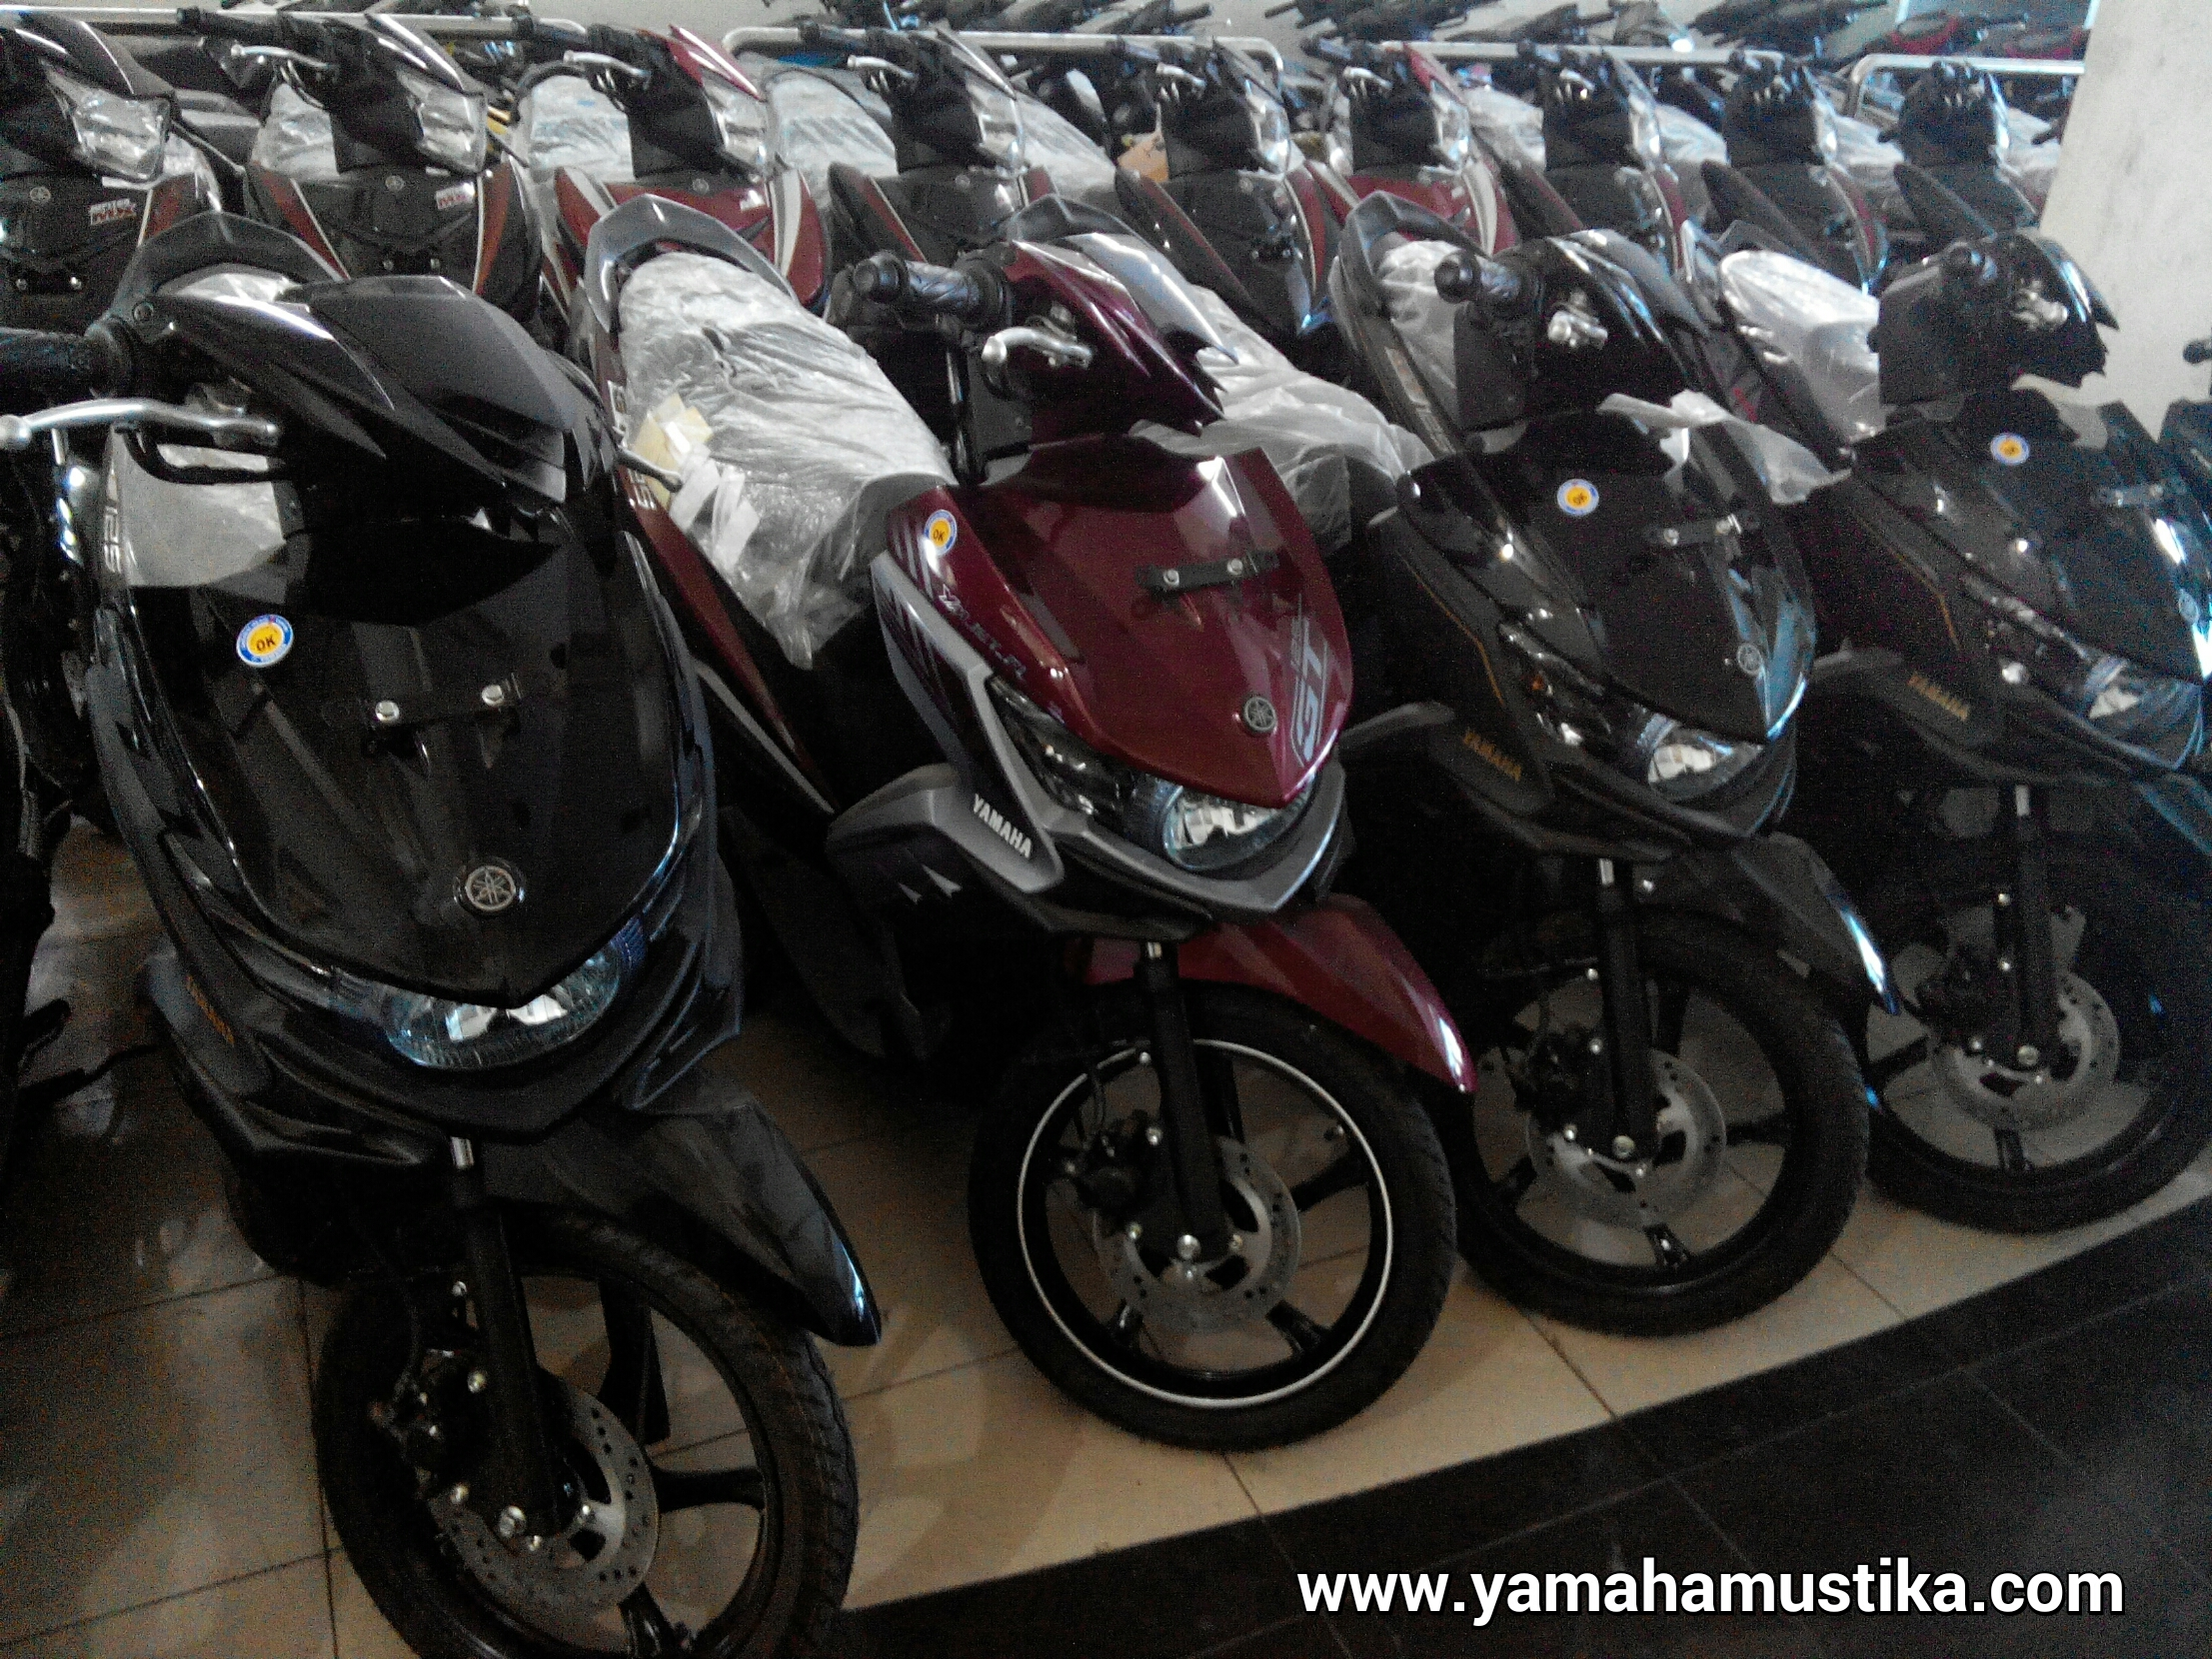 Yamaha Mio M3 menggunakan Pertalite, Semakin Tanpa Kompromi